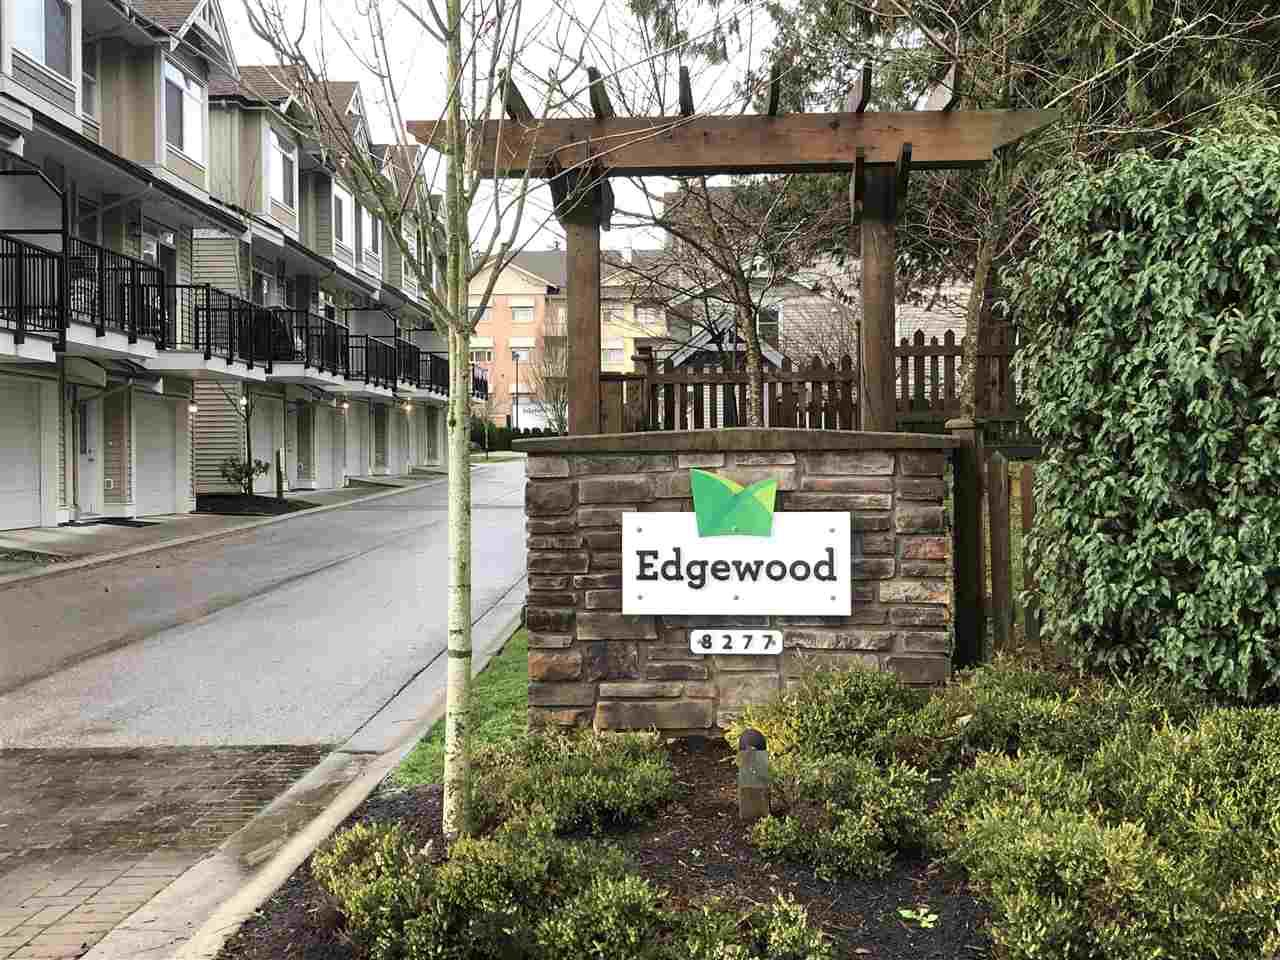 "Main Photo: 41 8277 161 Street in Surrey: Fleetwood Tynehead Townhouse for sale in ""Edgewood"" : MLS®# R2328439"